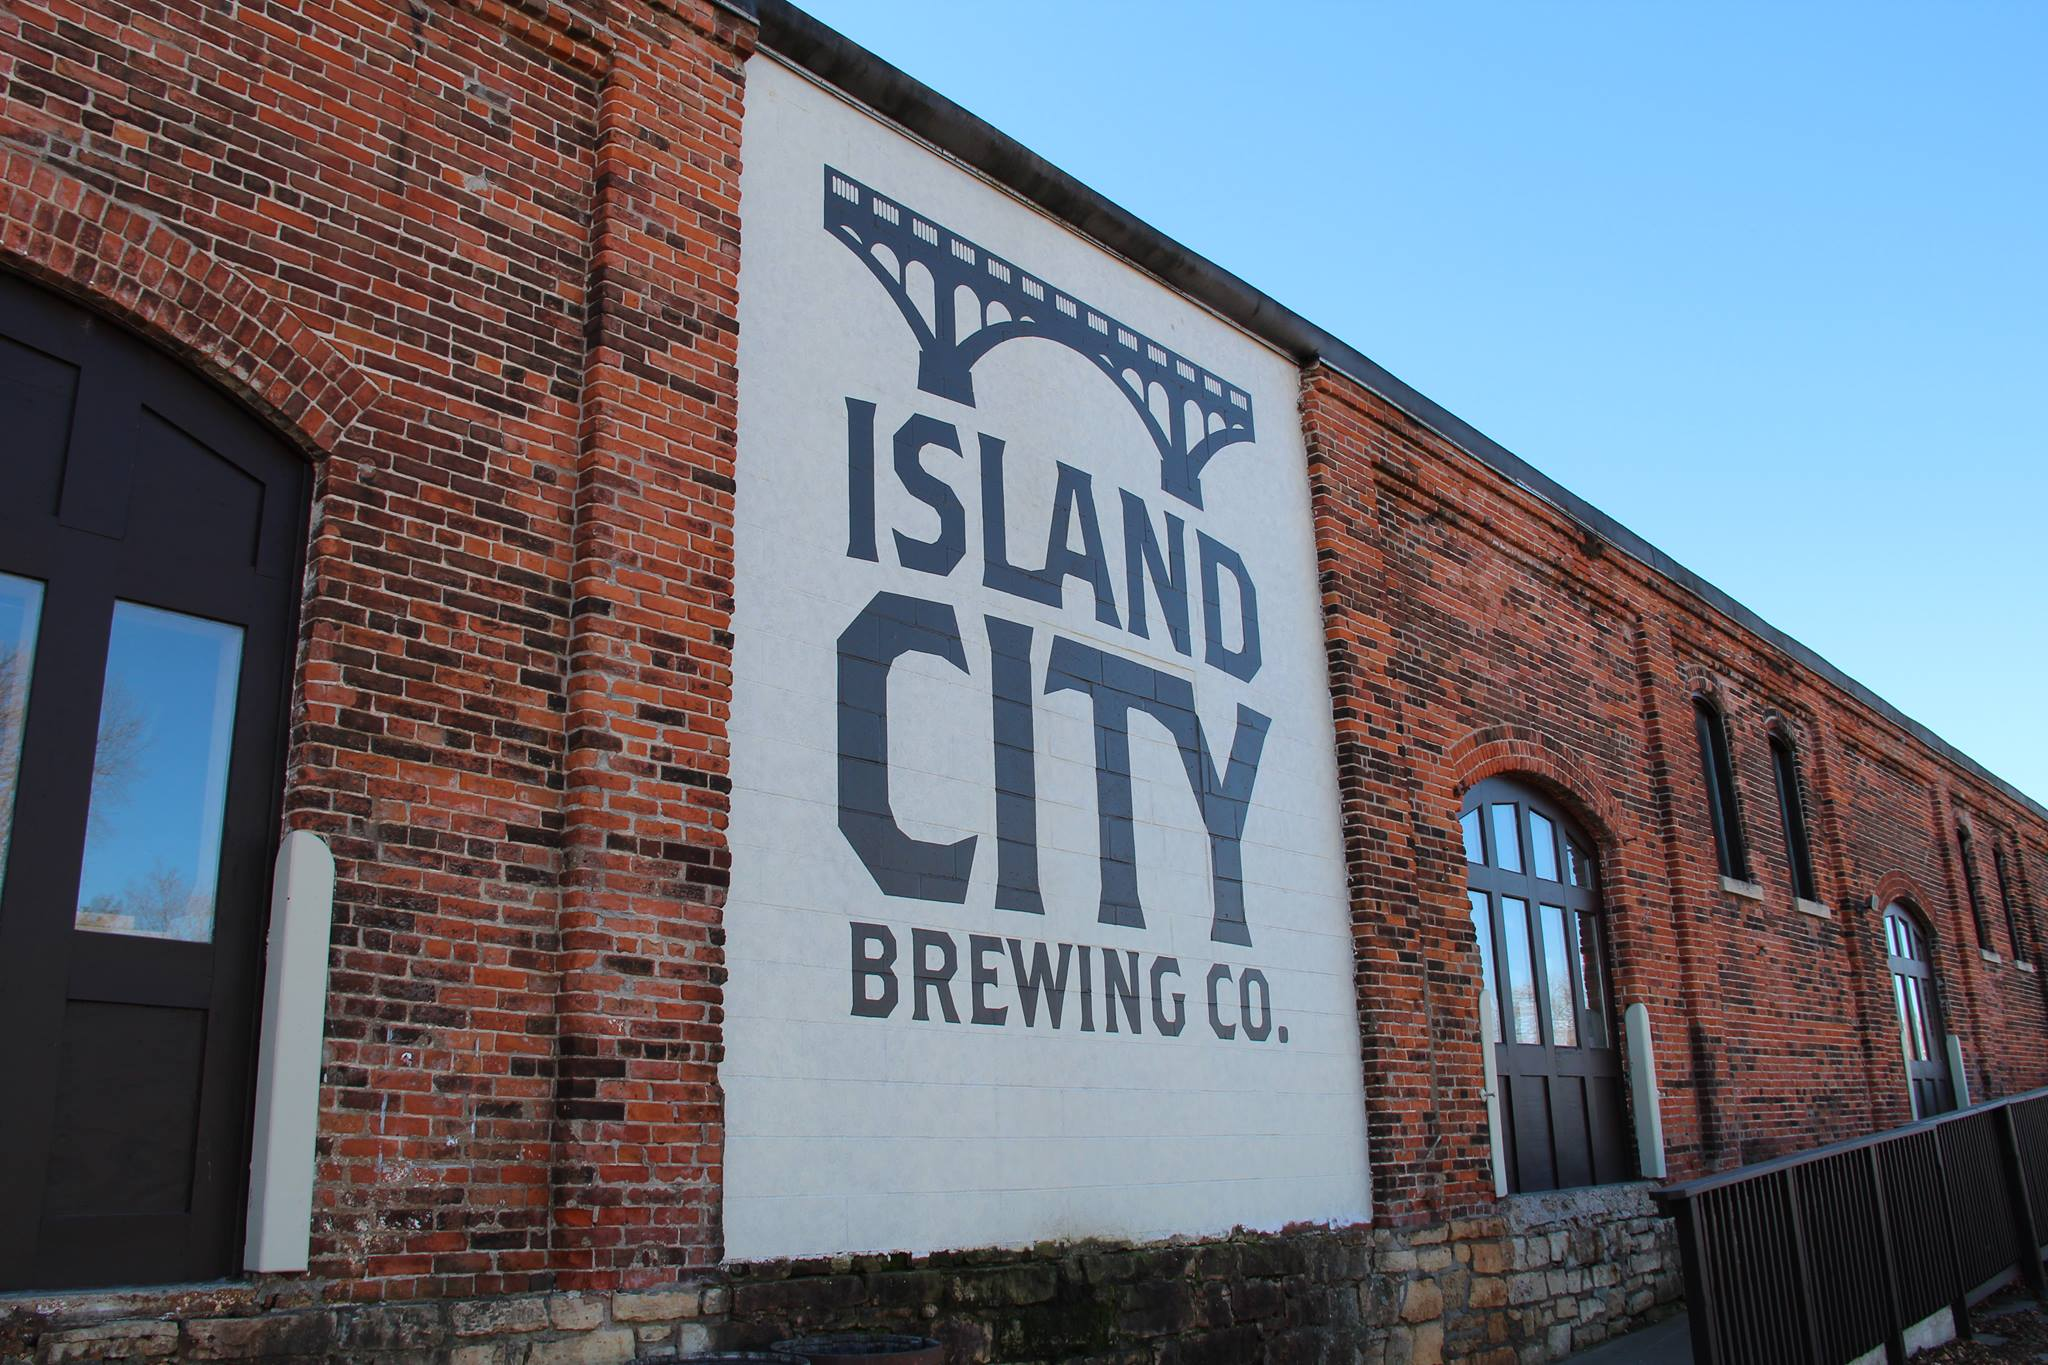 island, city, brewery, winona, minnesota